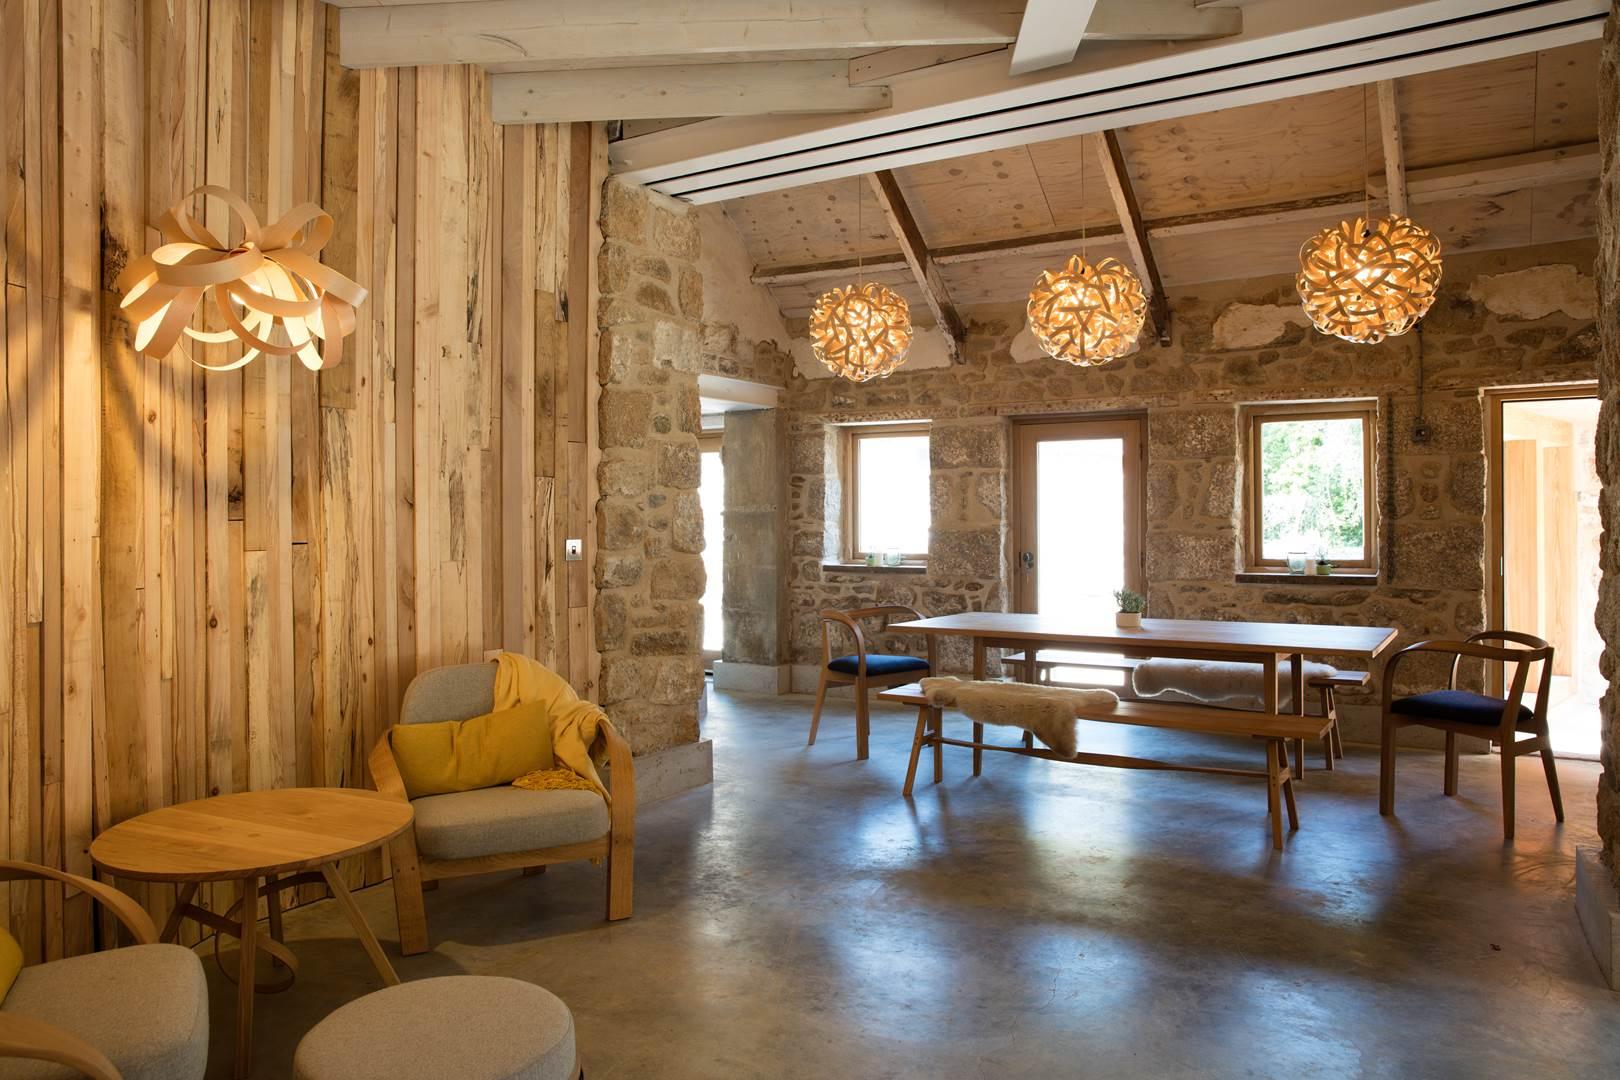 113-tom-raffield-grand-designs-house (Copy)